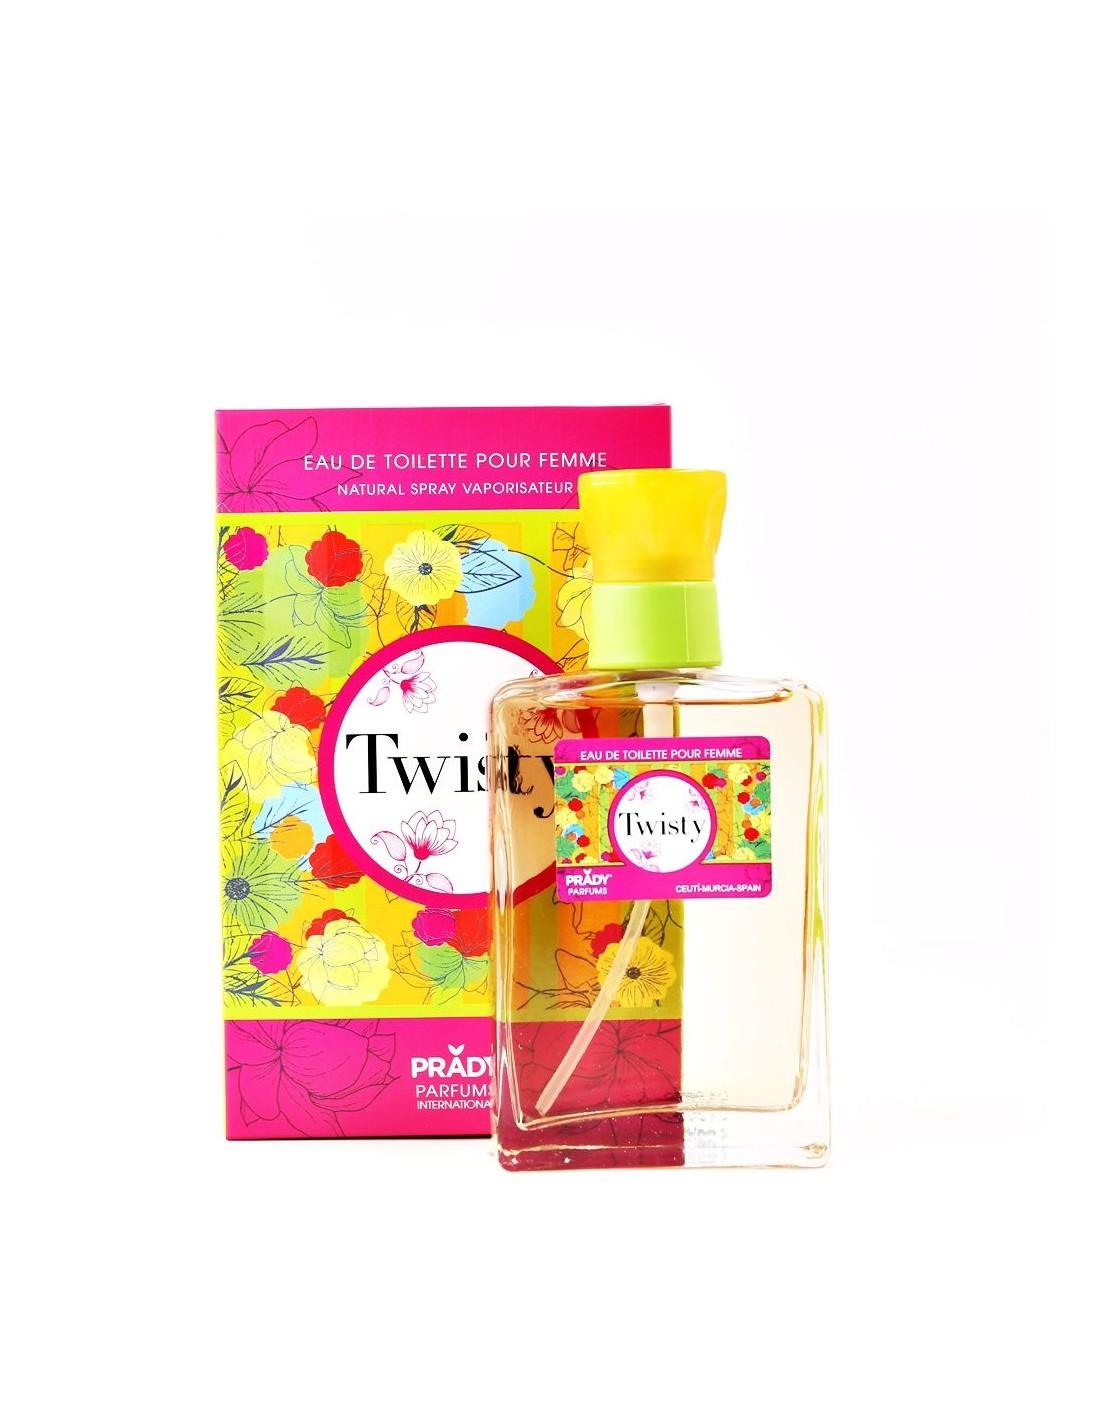 Parfum generique parfum prady femme twisty